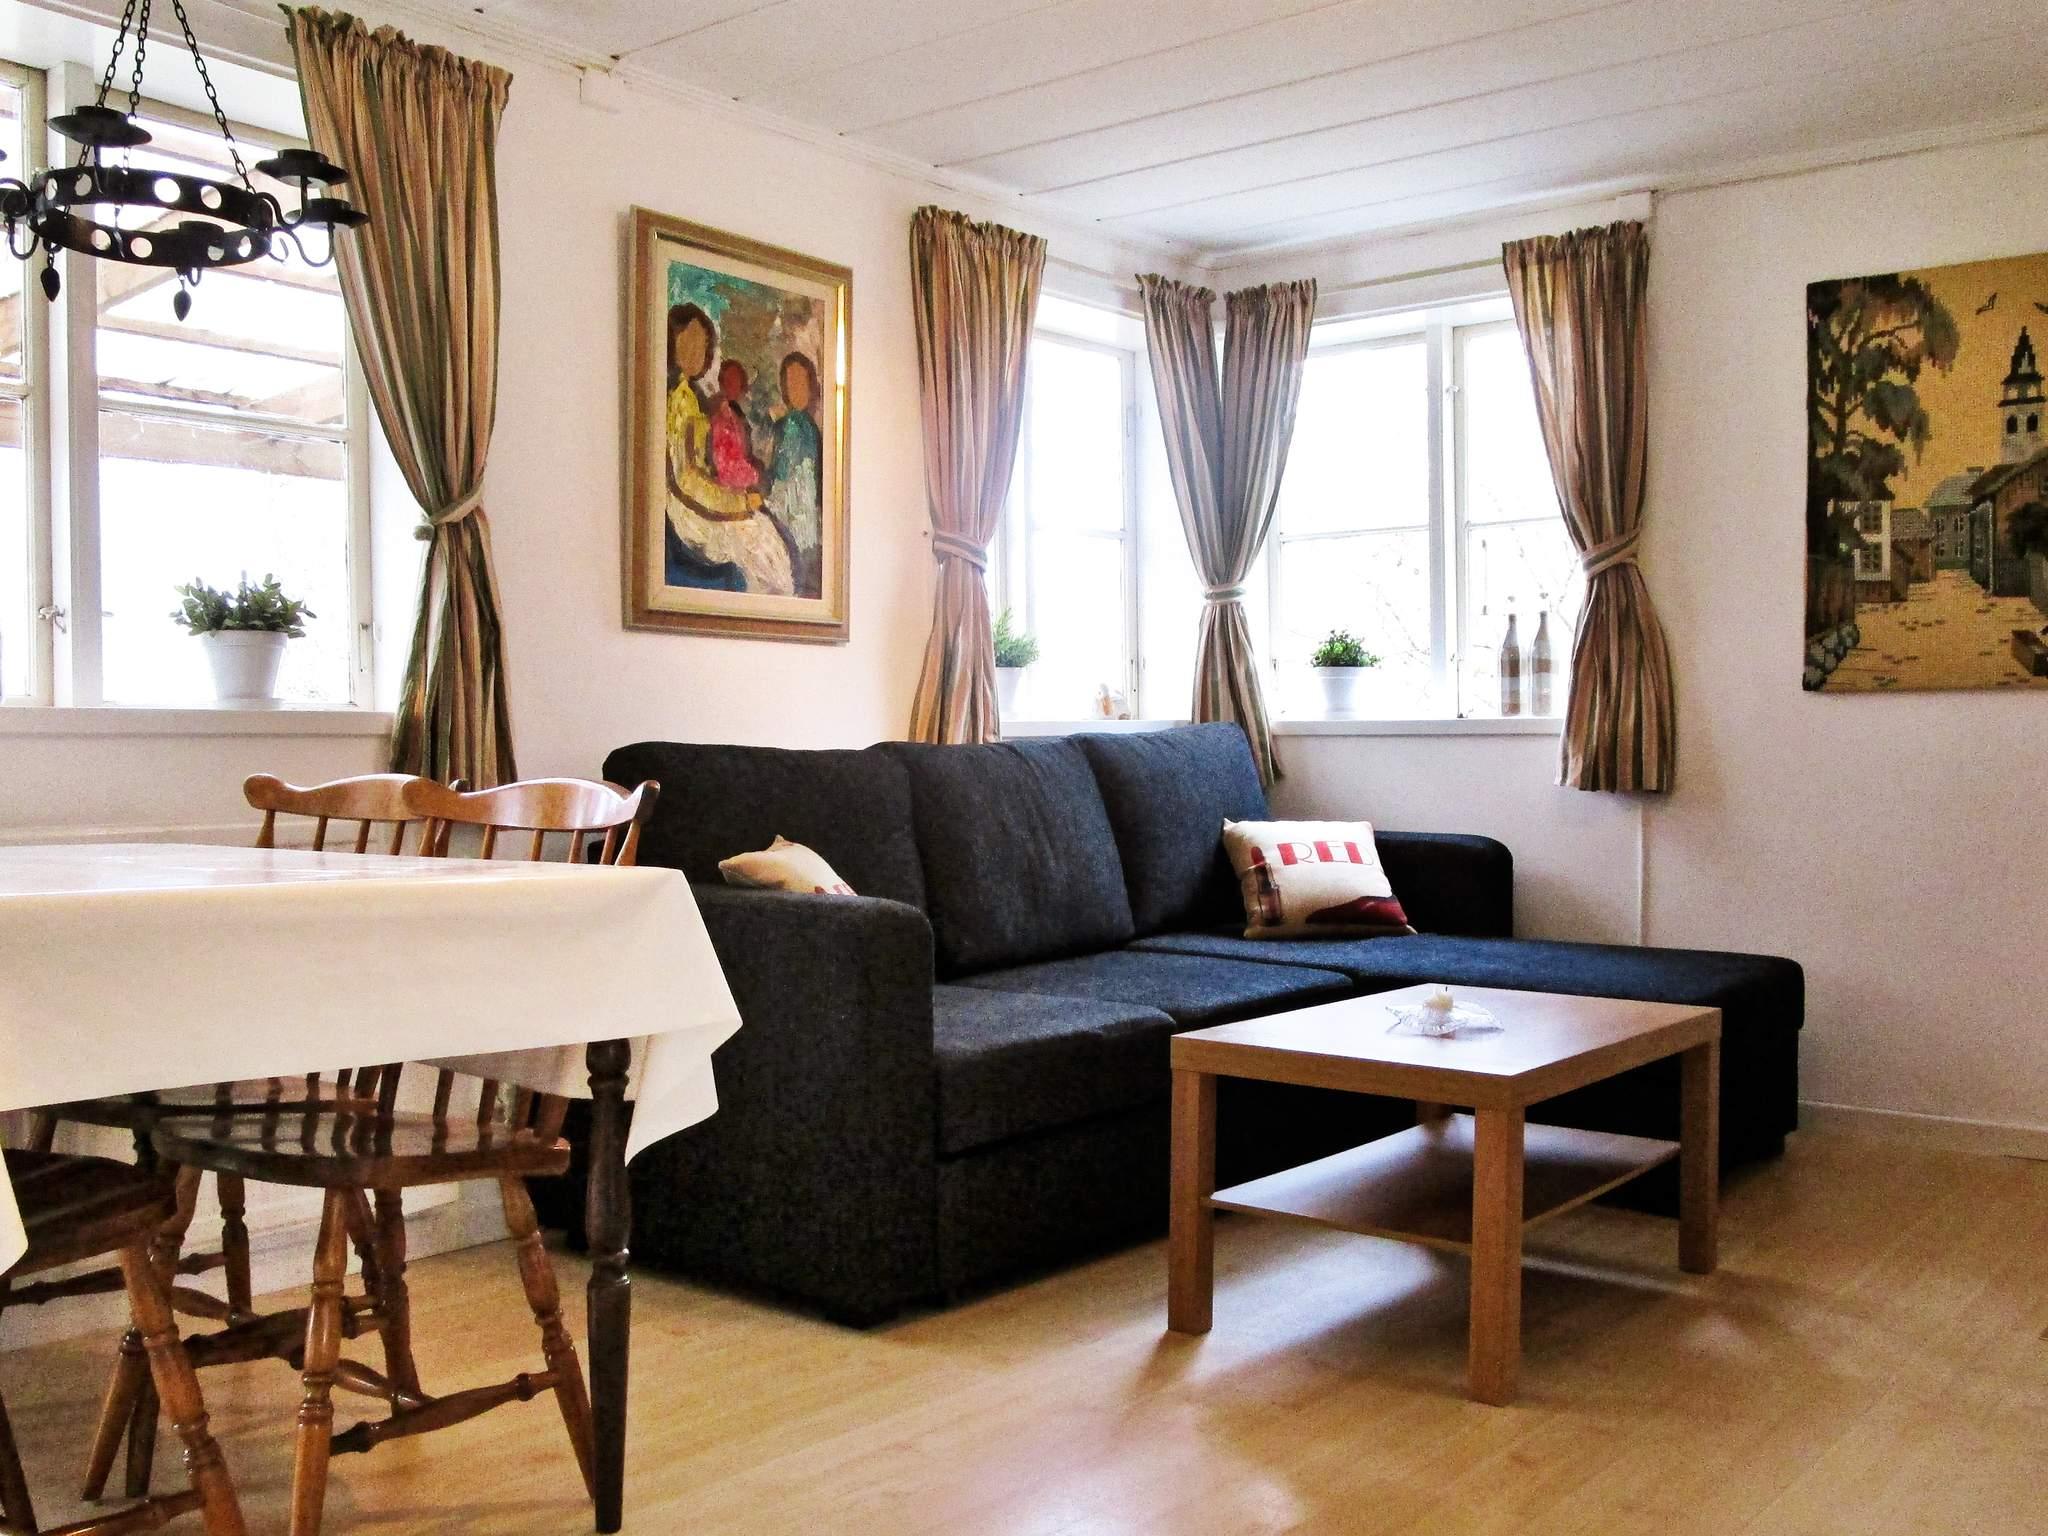 Ferienhaus Melldala (82042), Lerdala, Västra Götaland län, Westschweden, Schweden, Bild 6